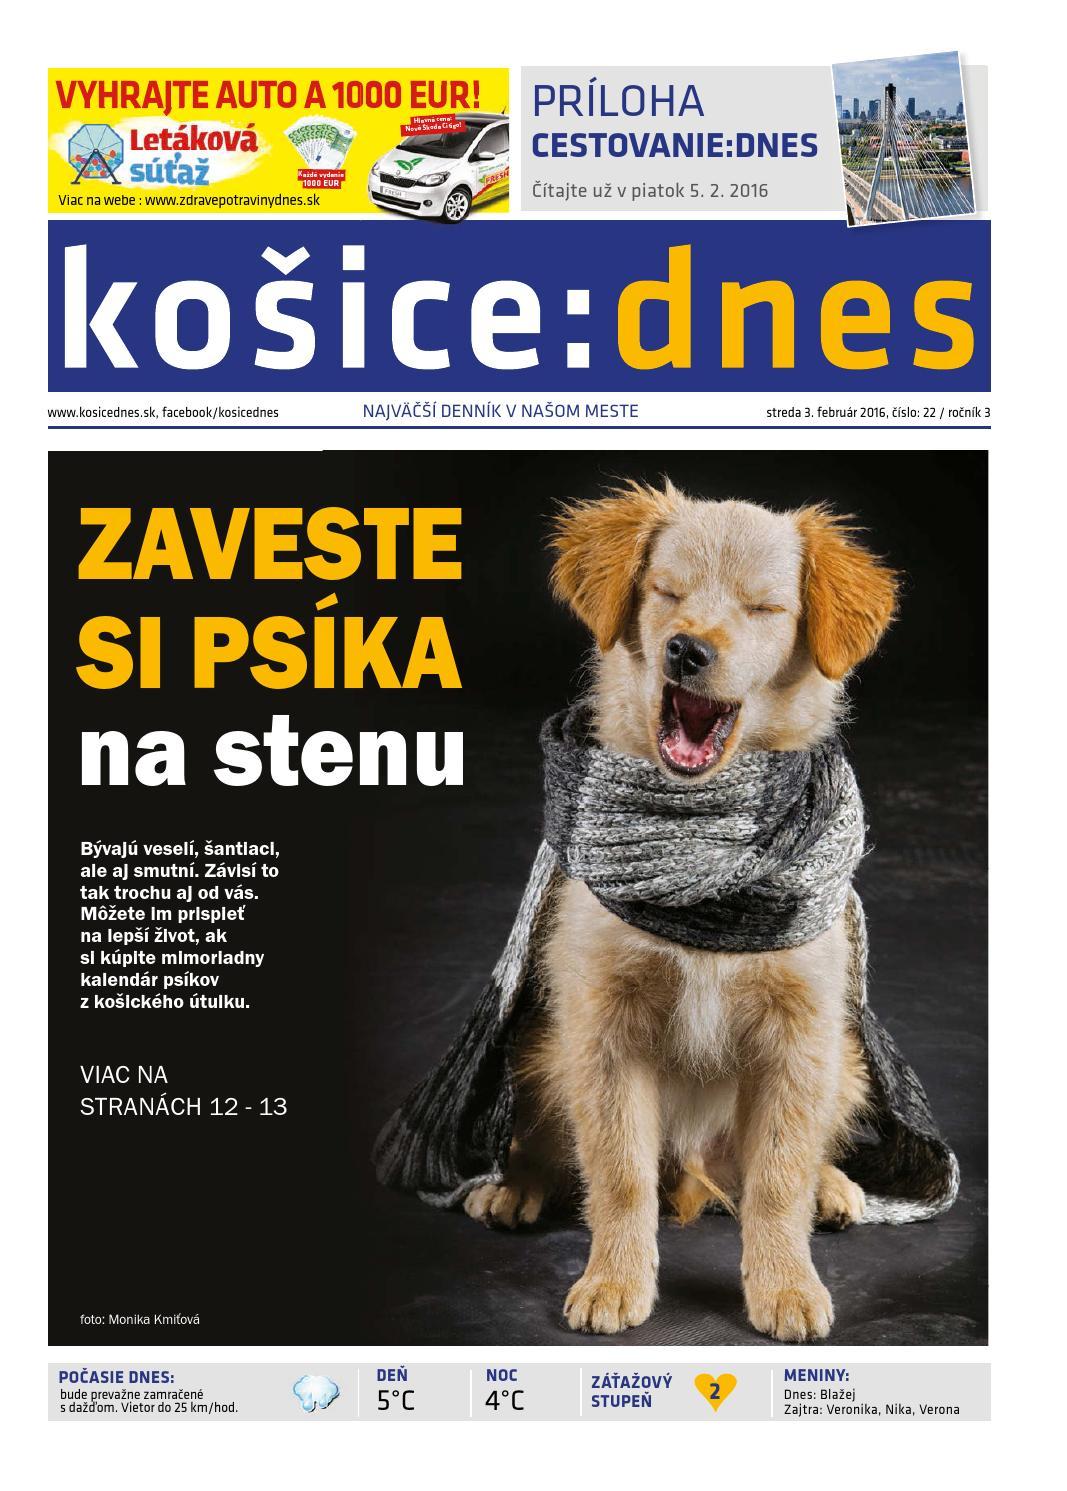 f2ebdc7e5701 košice dnes 3.2. 2016 by KOŠICE DNES - issuu